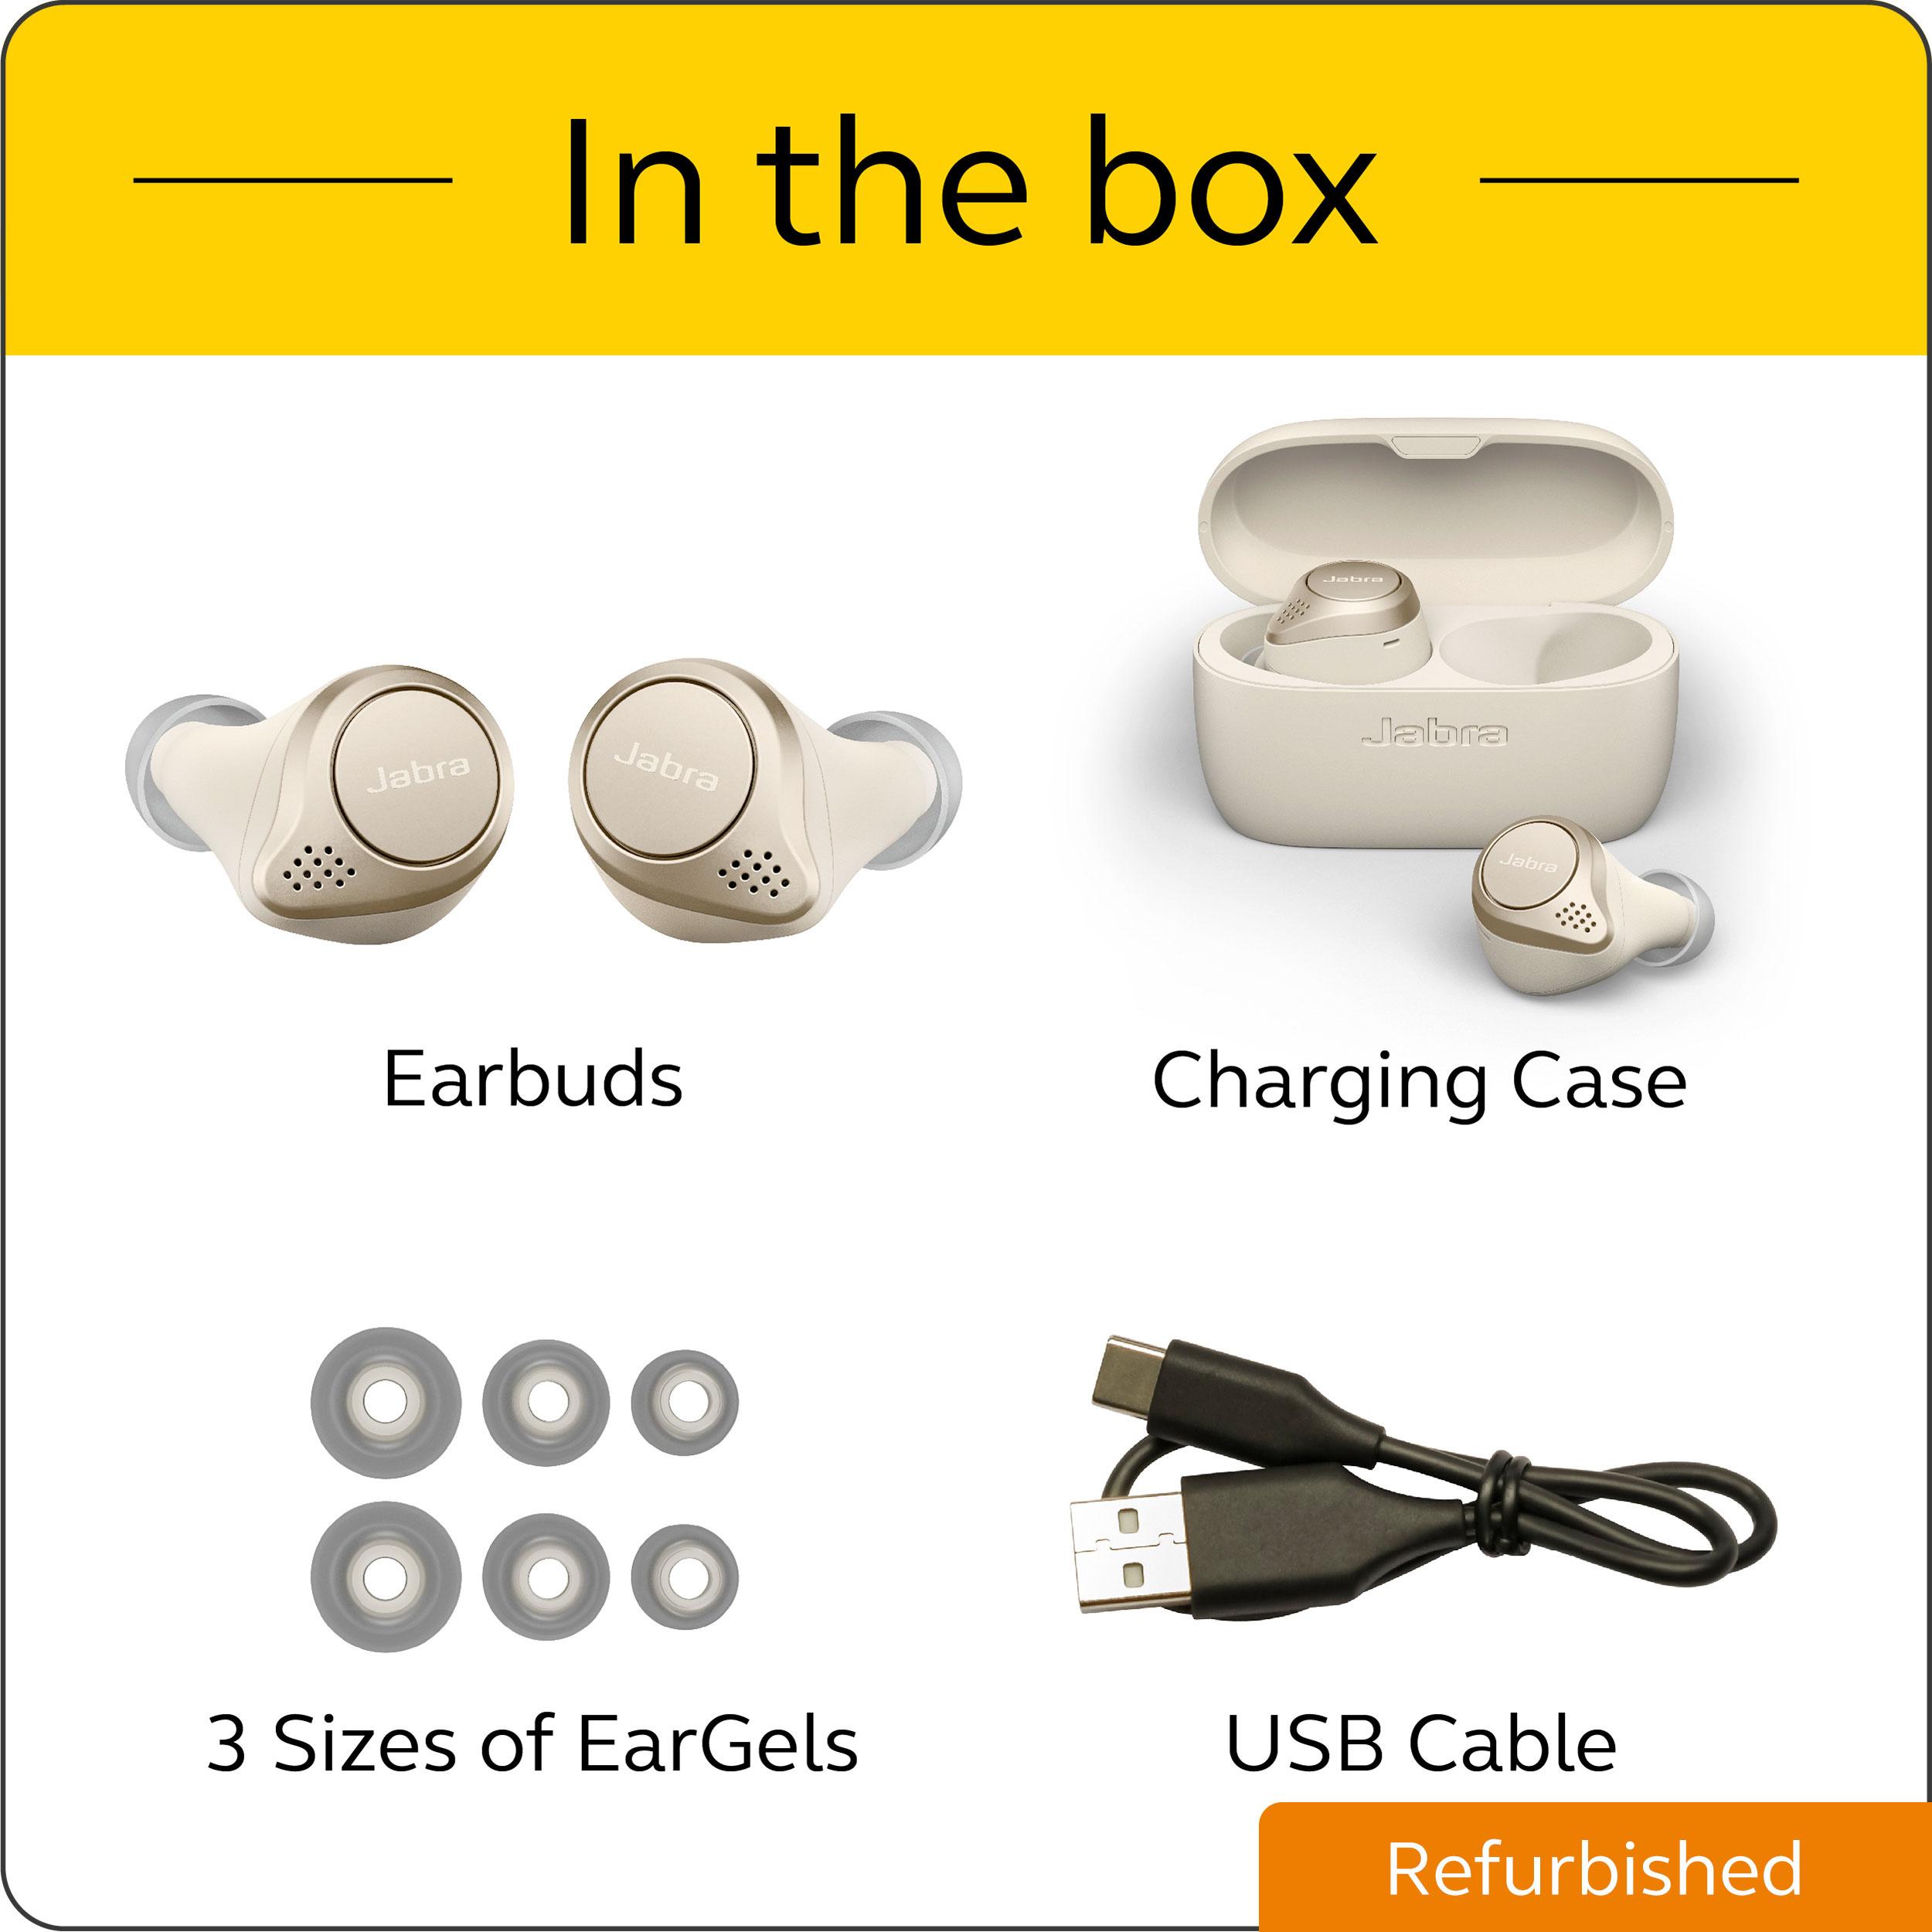 thumbnail 15 - Jabra-Elite-75t-Voice-Assistant-True-Wireless-earbuds-Certified-Refurbished